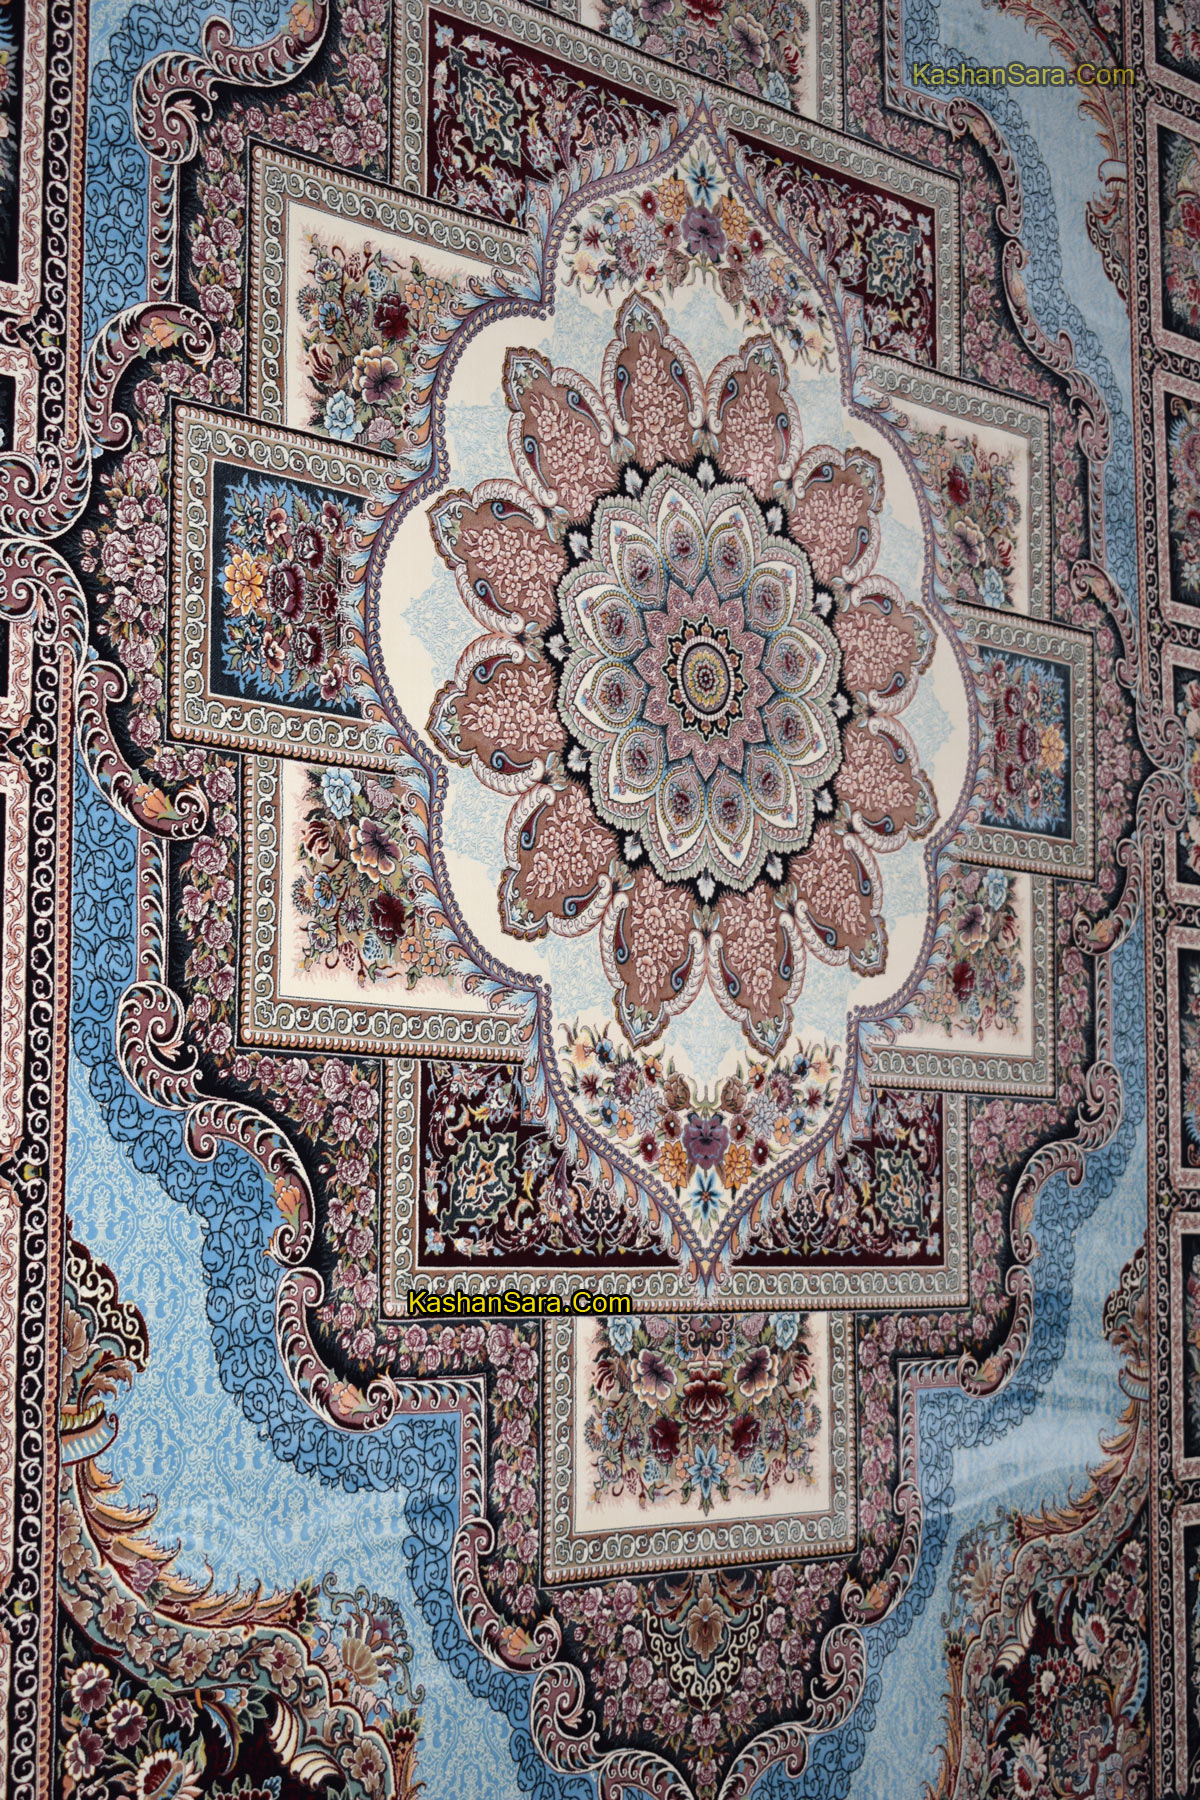 فرش ۱۲۰۰ شانه تراکم ۳۶۰۰ نقشه حوض نقره آبی